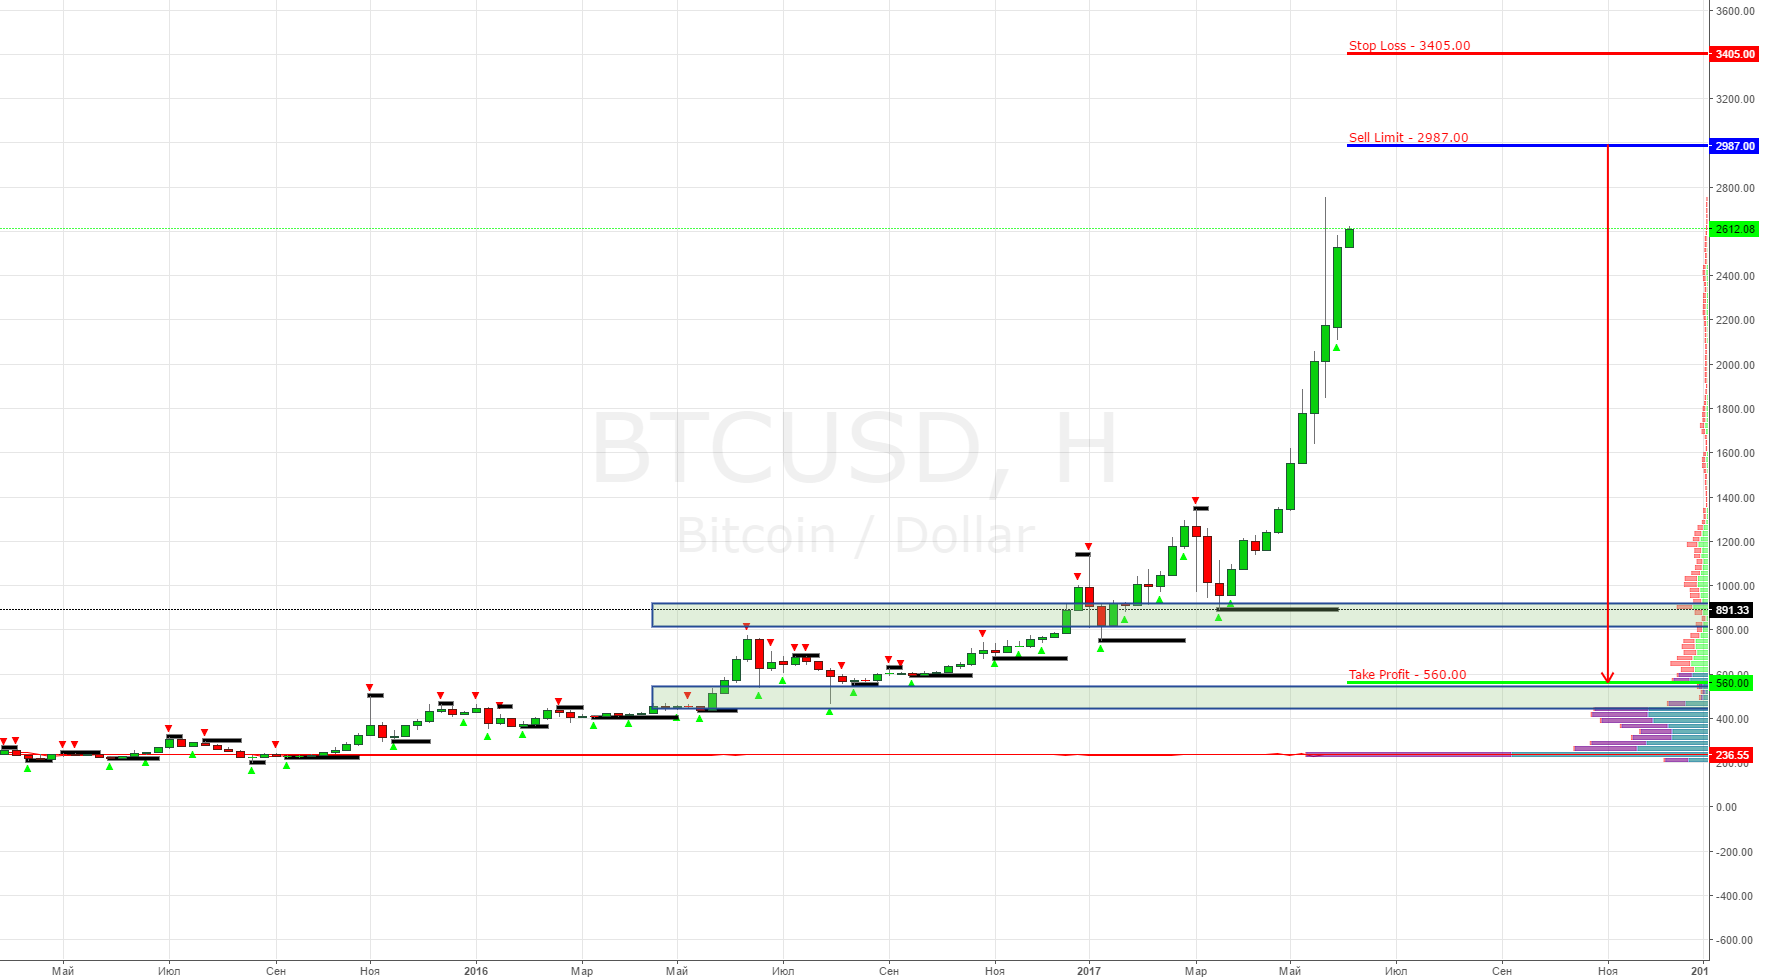 BTC/USD (Bitcoin) Sell Limit 2987.00 (Долгосрок на 6-9 месяцев)